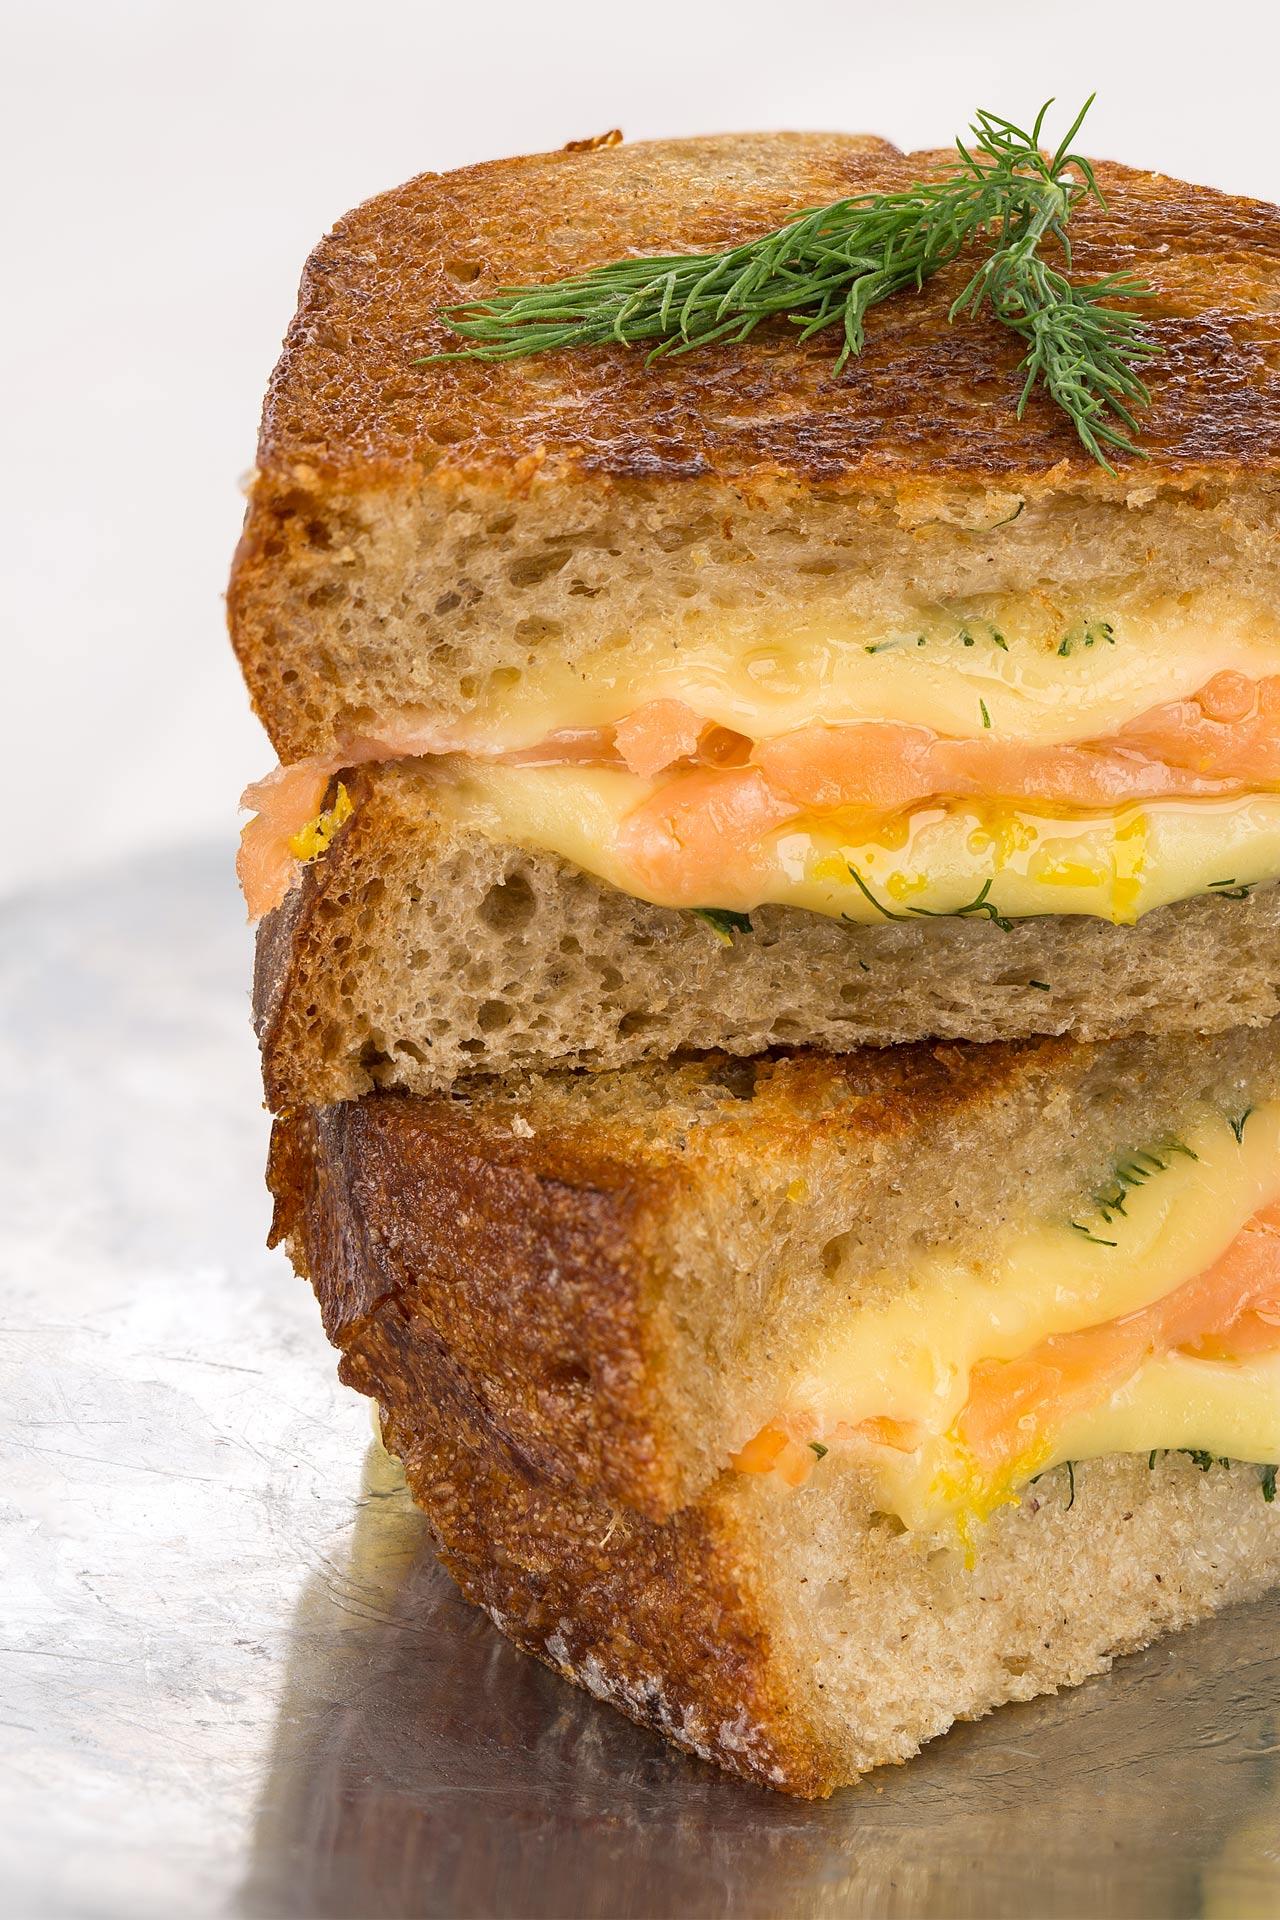 Croque-monsieur with smoked salmon